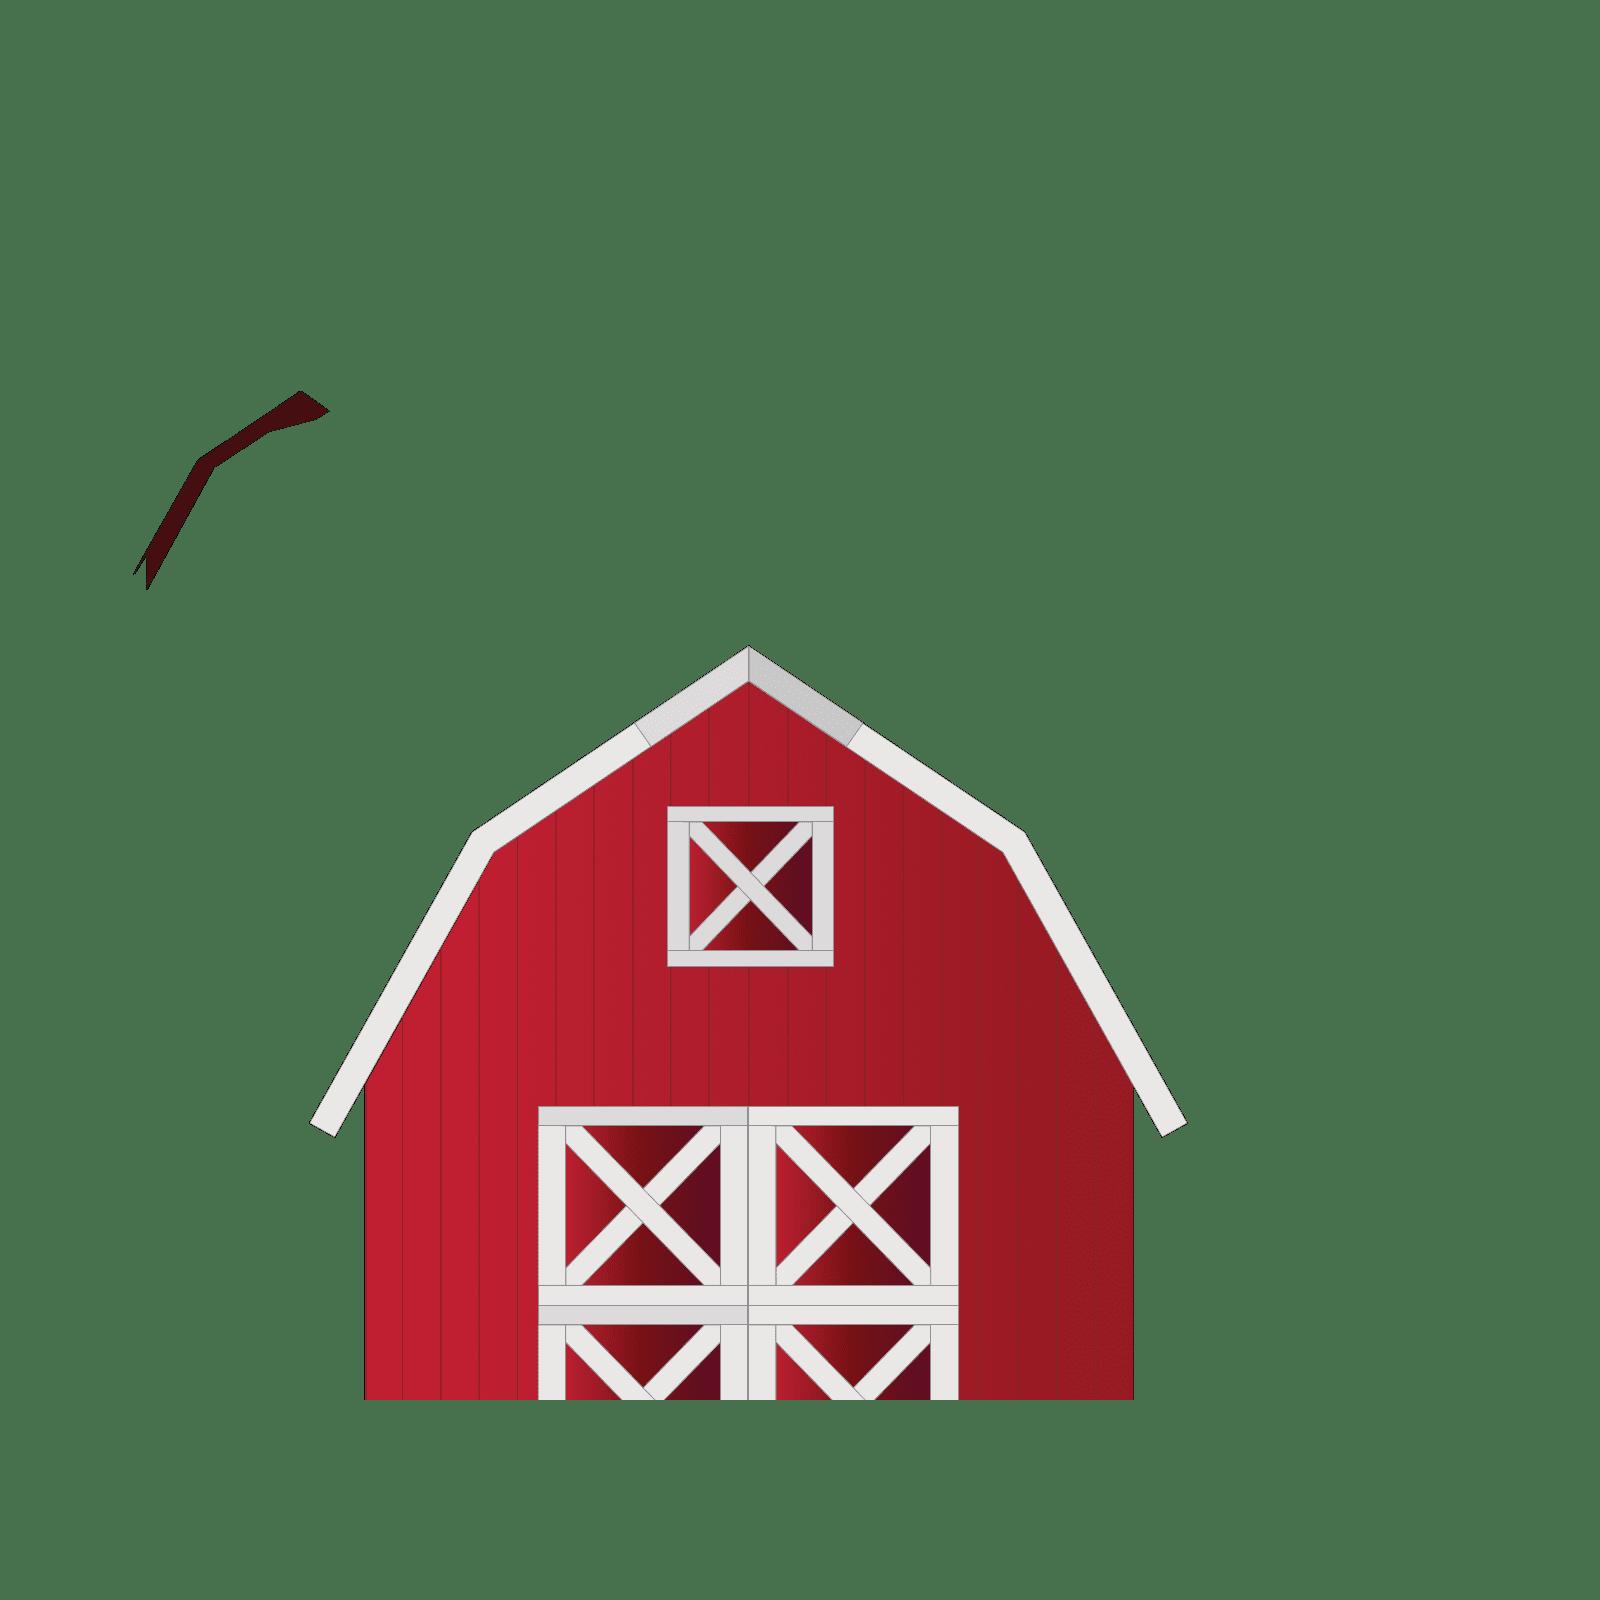 Barn clipart free image